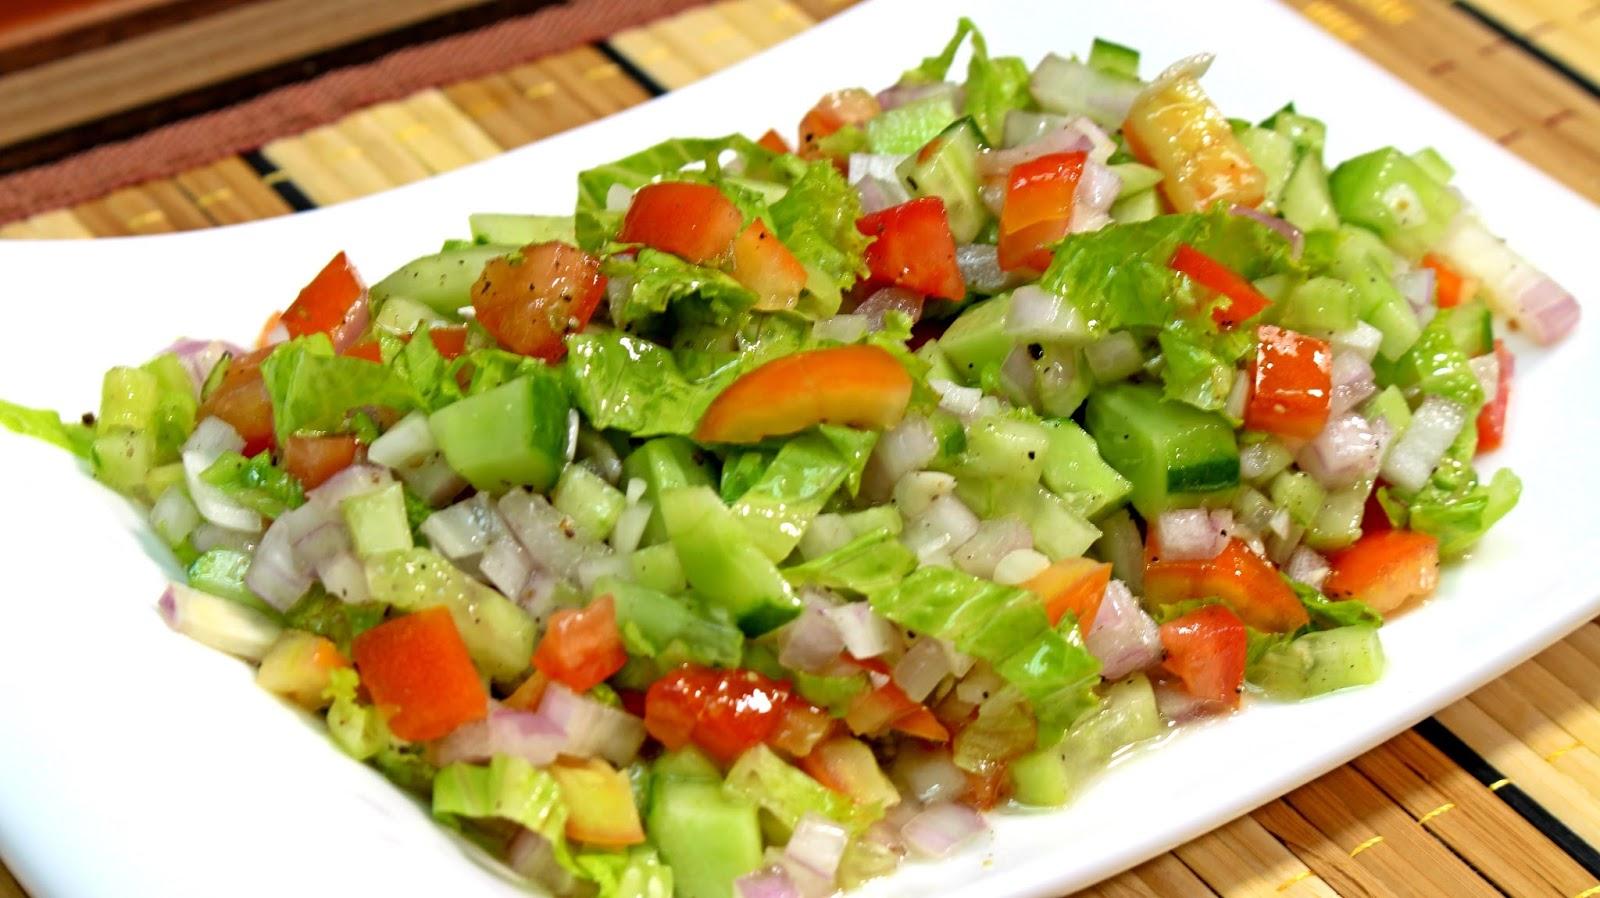 ensaladas para bajar de peso recetas